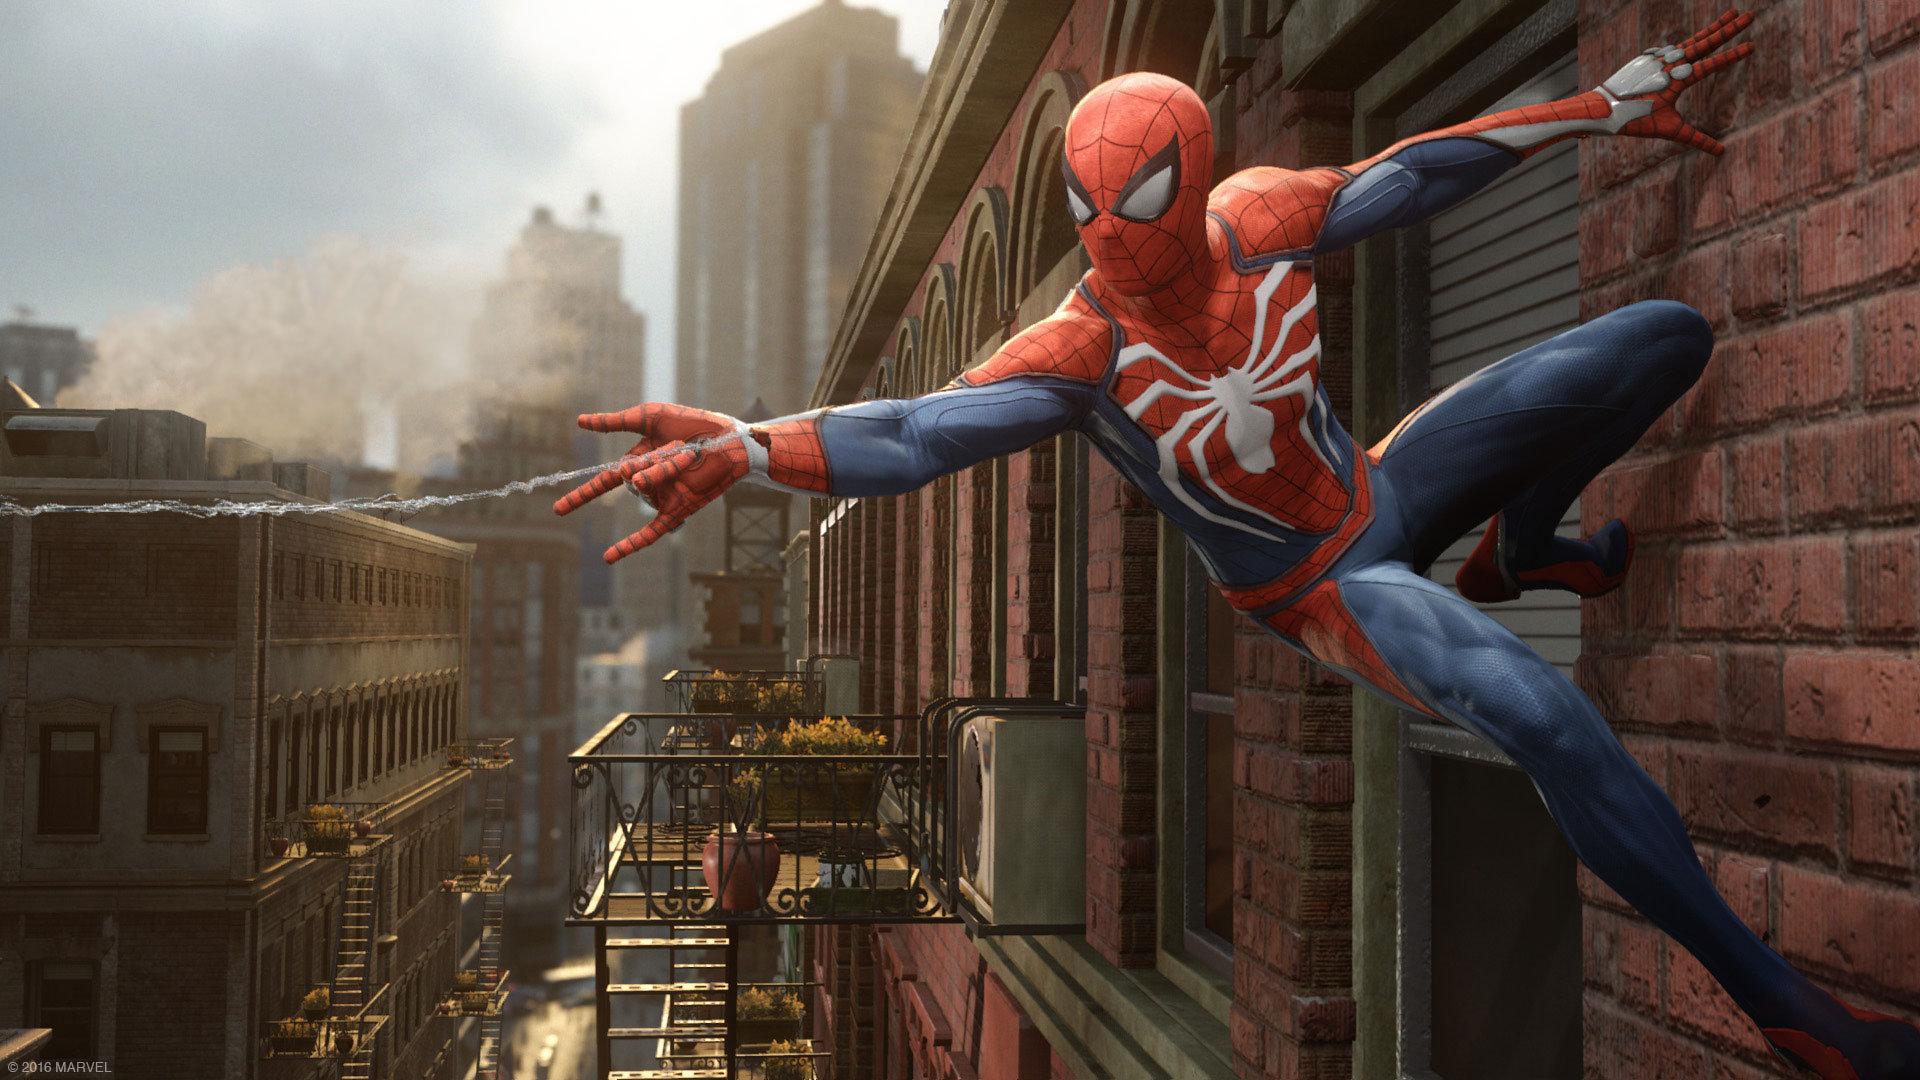 Spider-Man su PlayStation 4: Fotogramma dal gameplay di Spider-Man su PlayStation 4